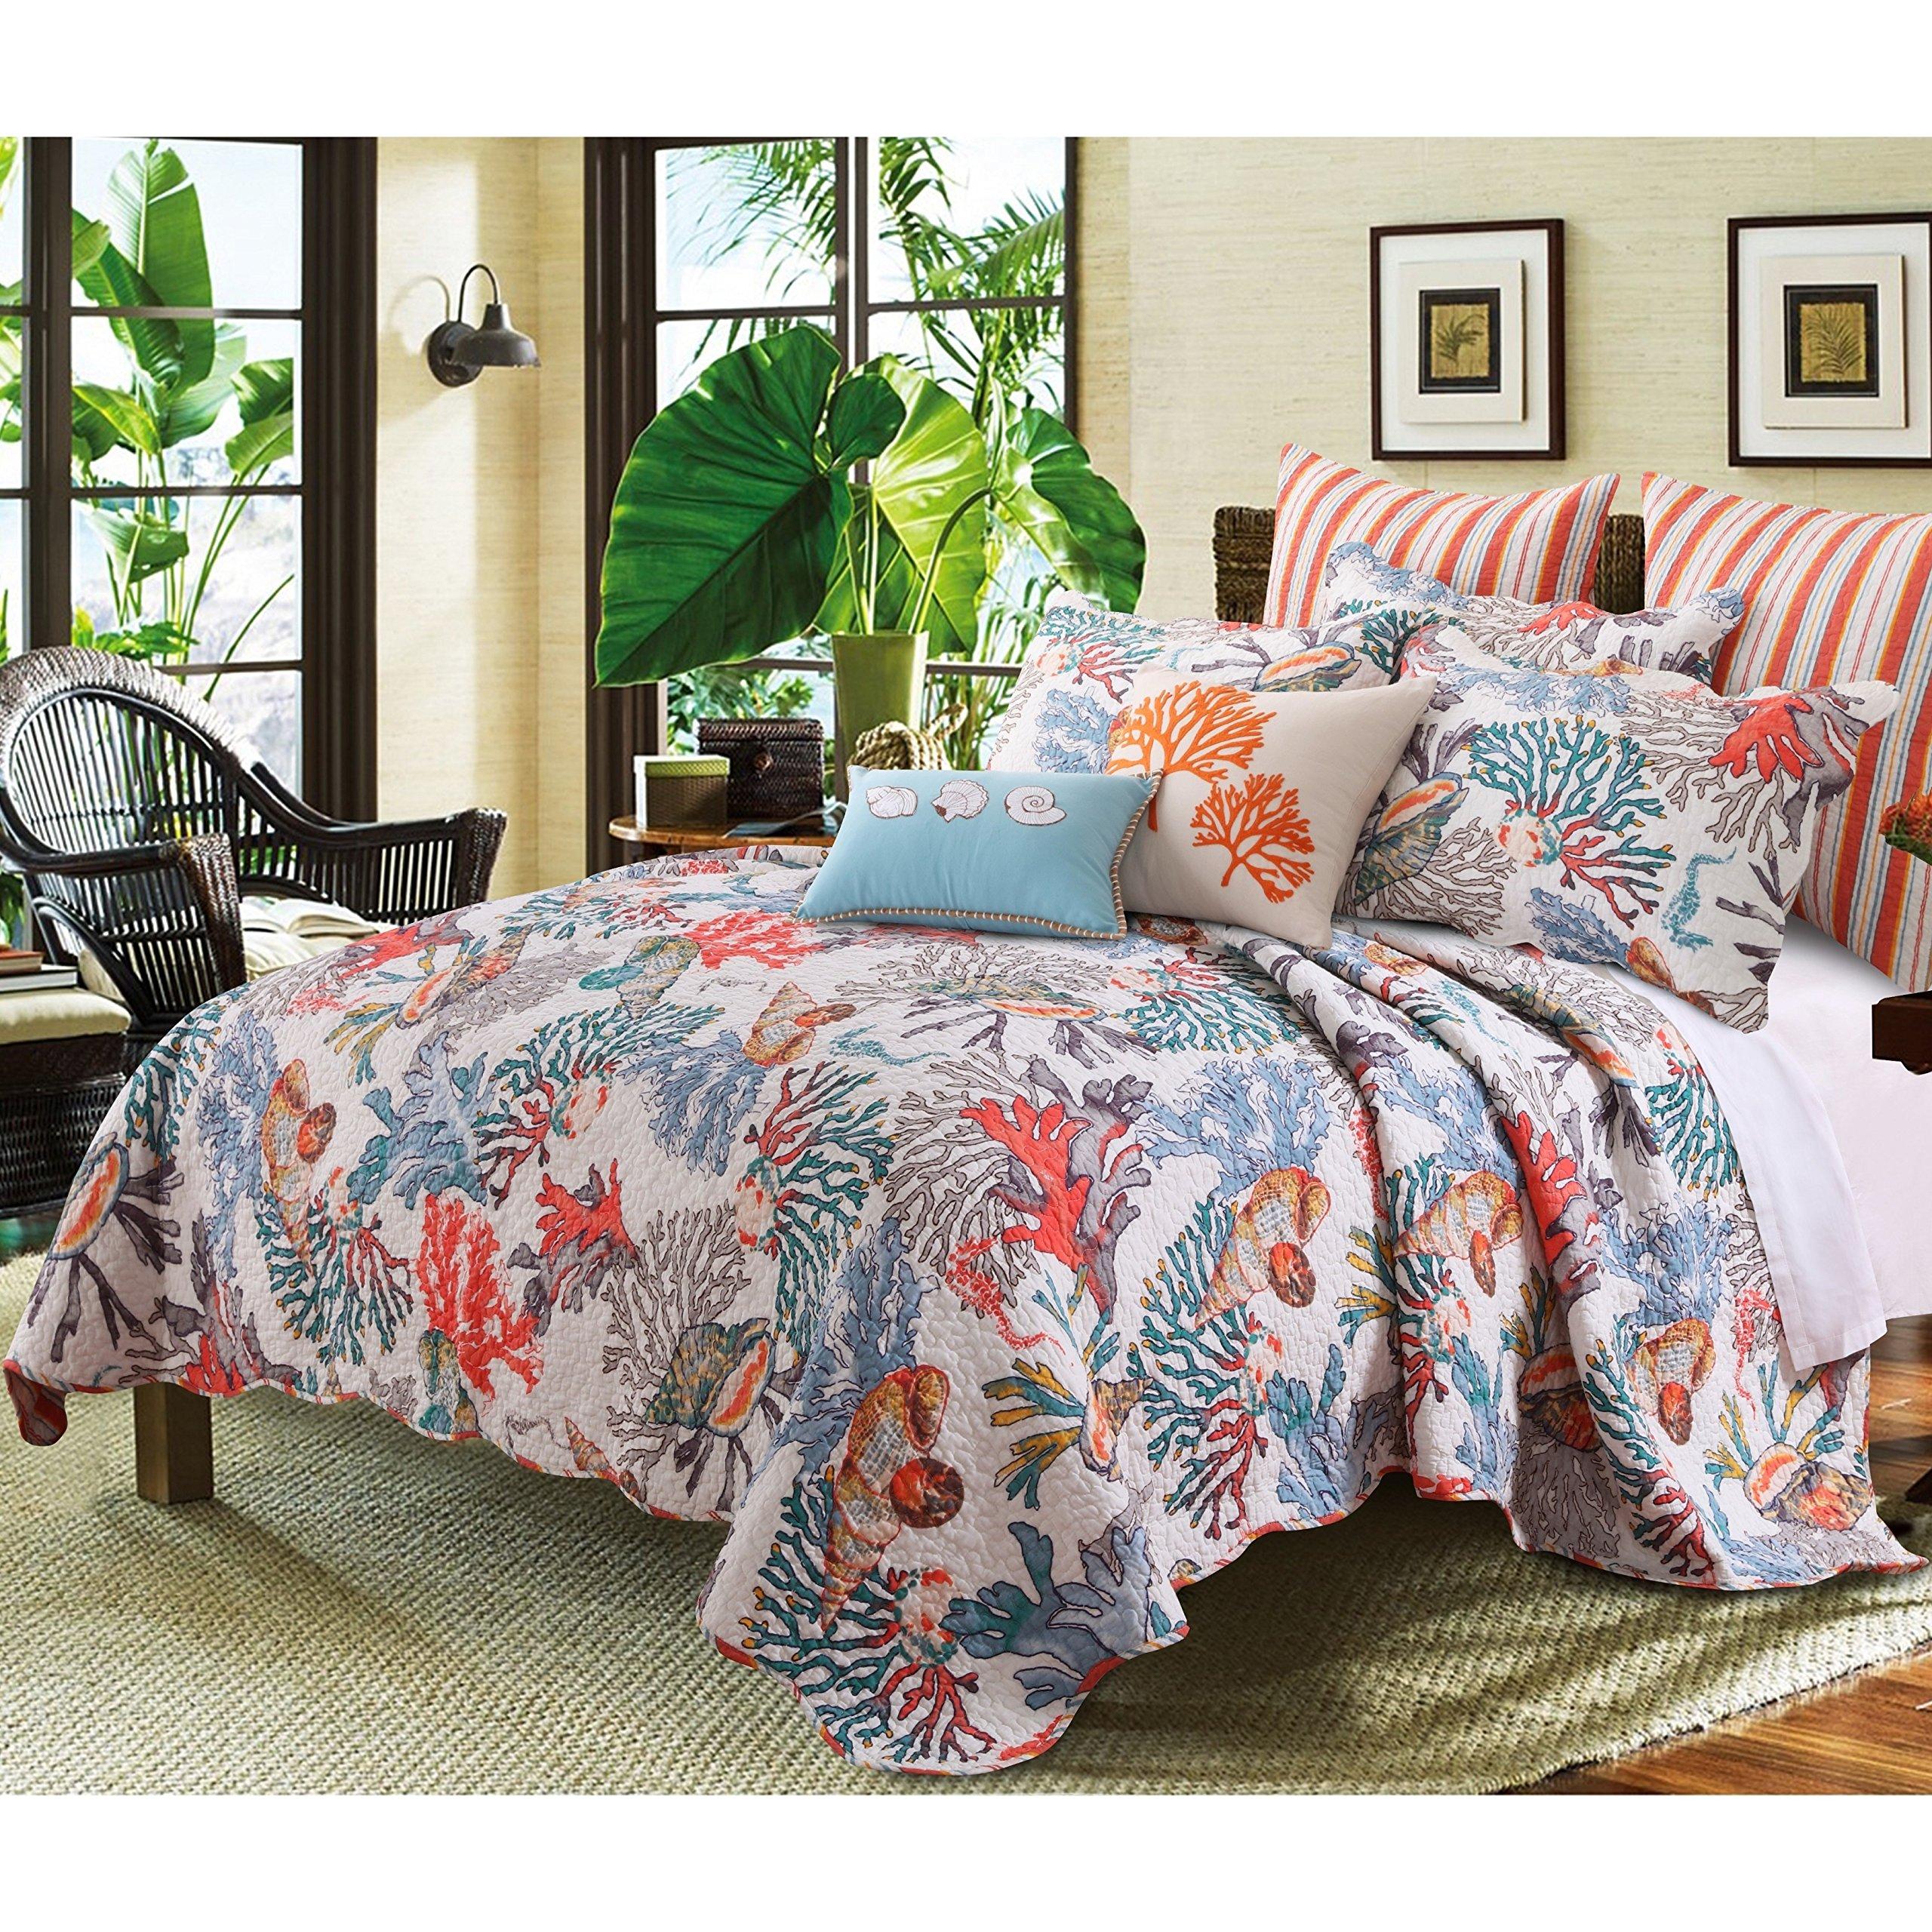 4 Piece Dreamy Atlantis Themed Reversible Quilt Set Twin Size, Classic Deep Coastal Printed Corals Themed Bedding, Dense Ocean Creatures Design, Artful Stylish Teenage Girls Bedroom, Blue, Orange